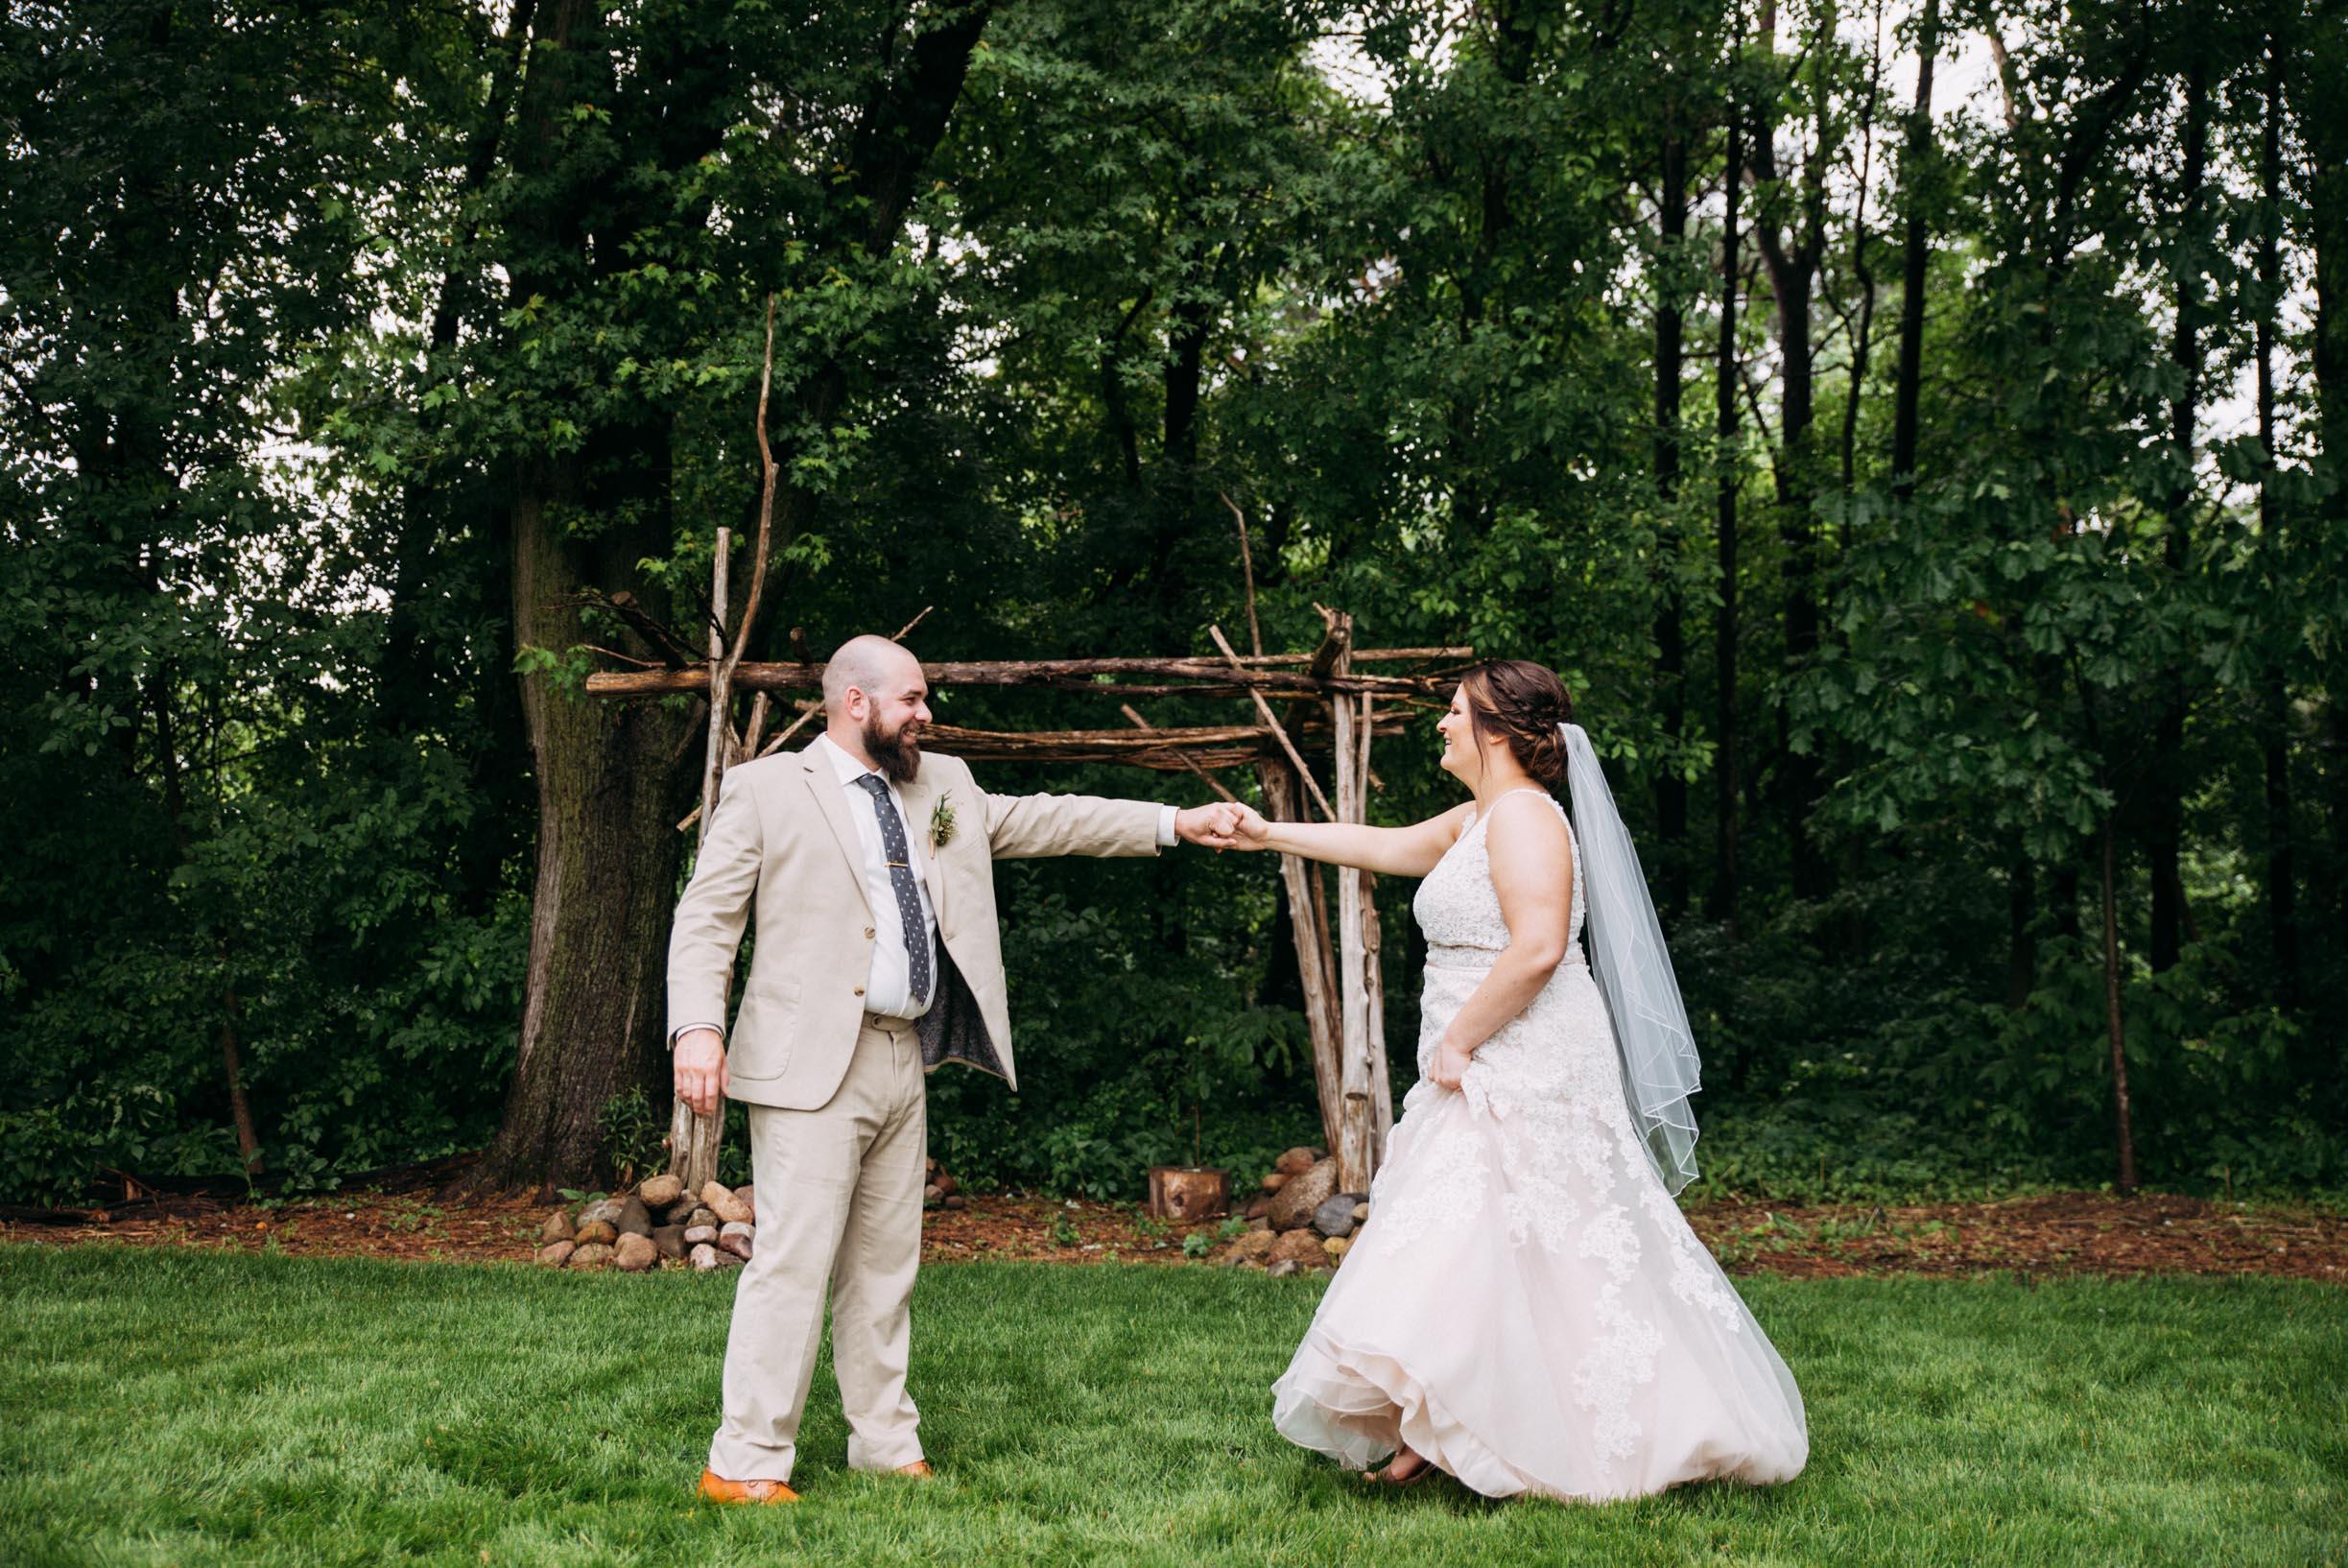 27-Jess_Jeremy_Minnesota_Wedding.jpg